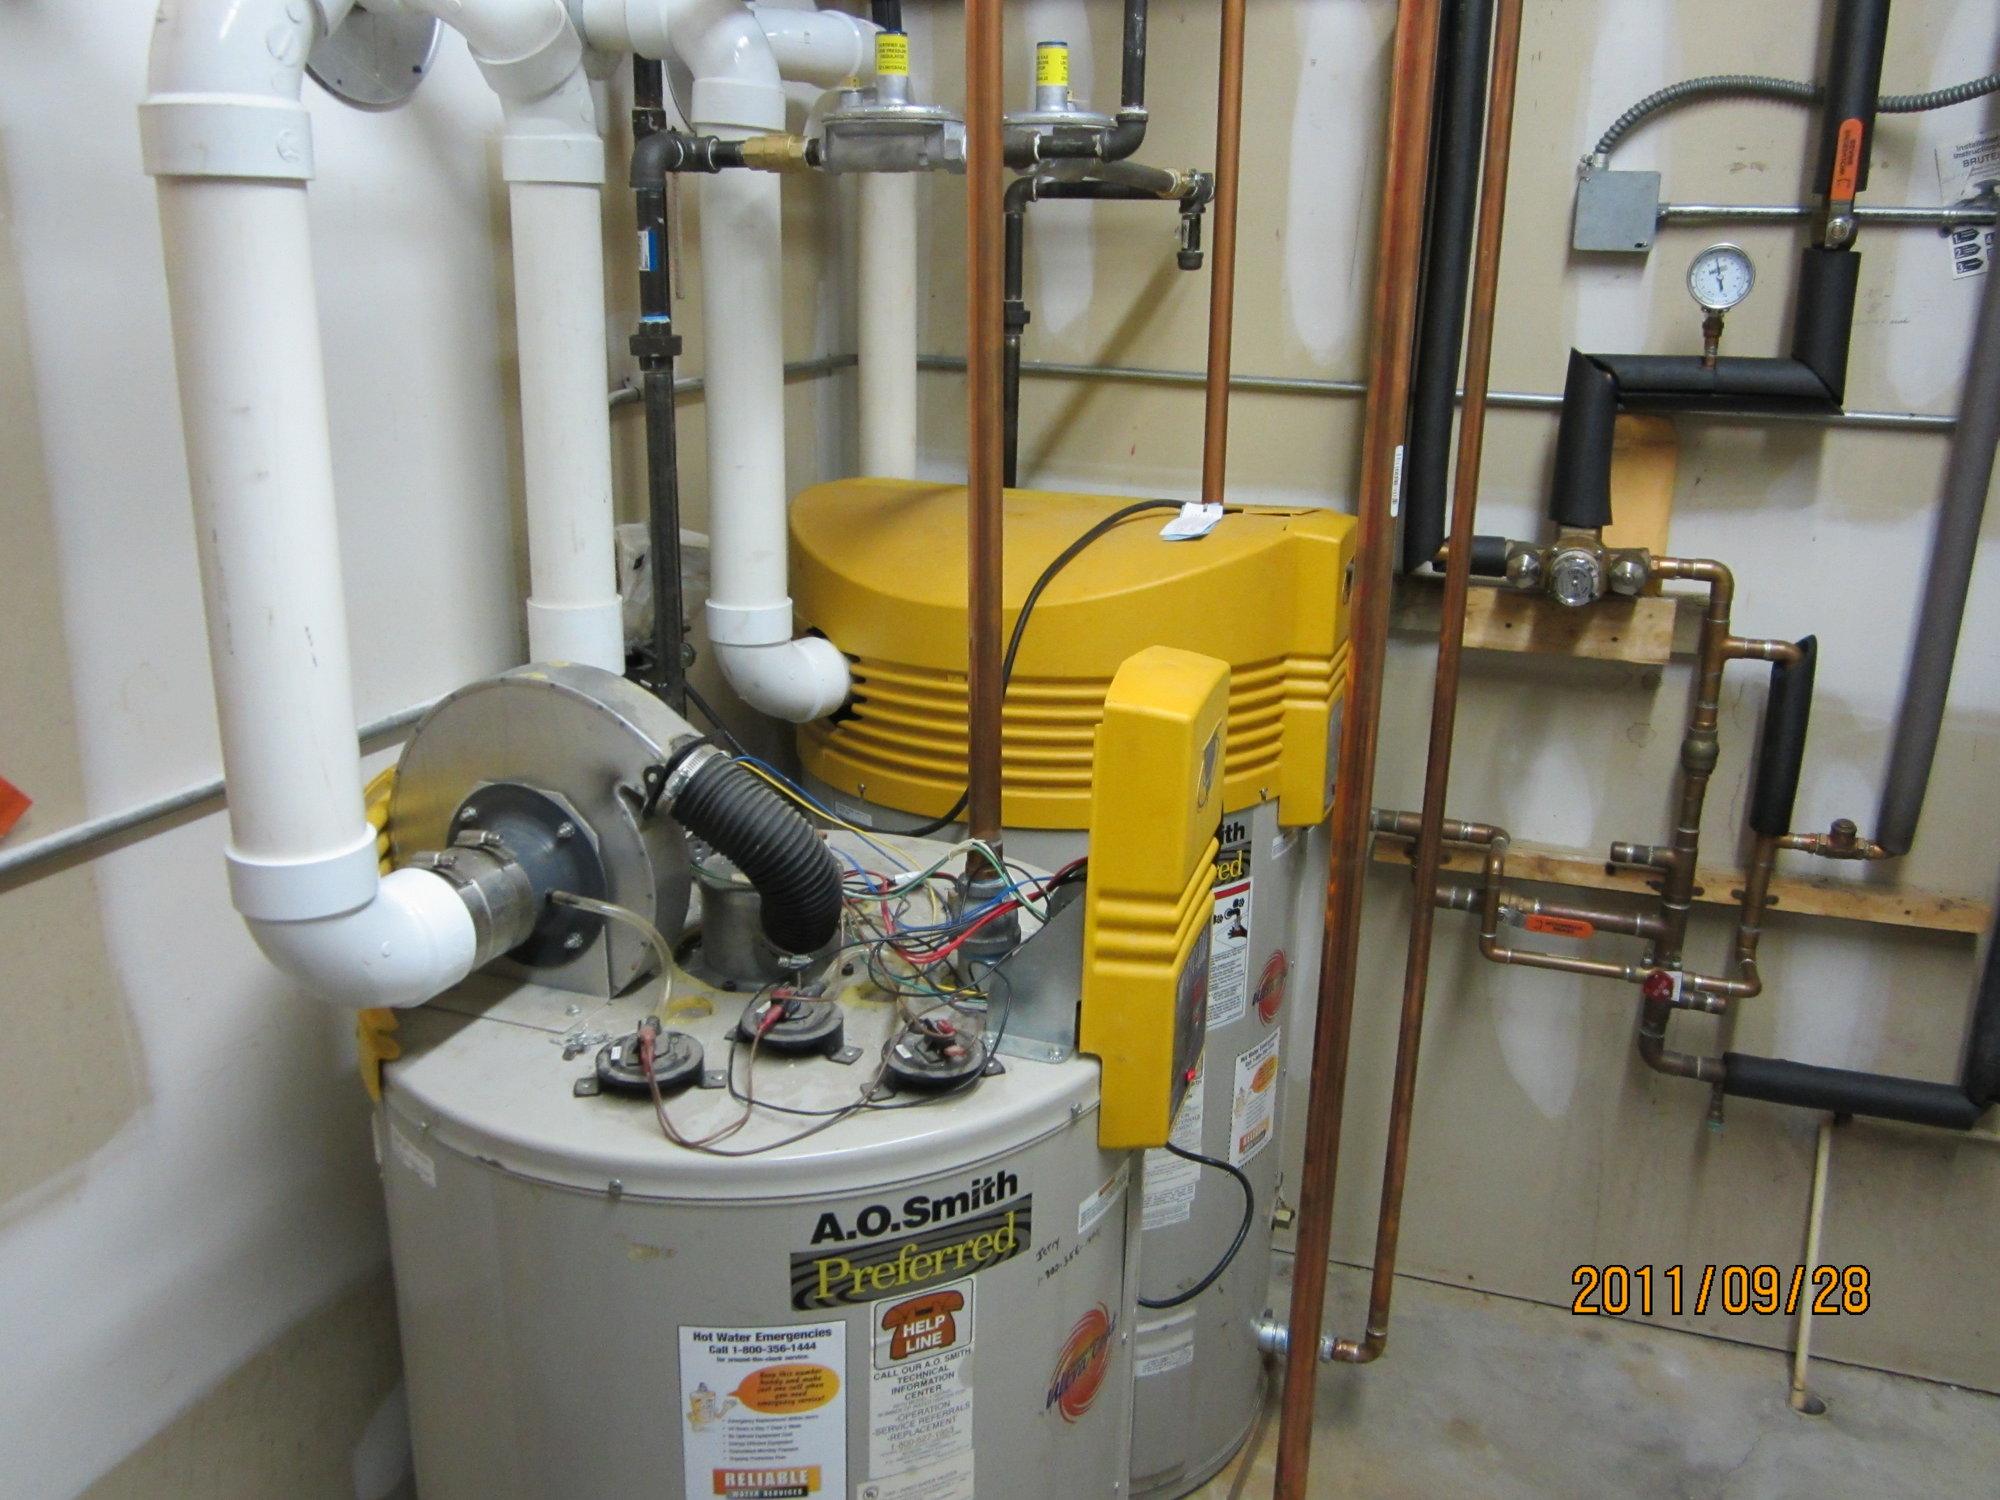 How Does The Boiler Room Make Money